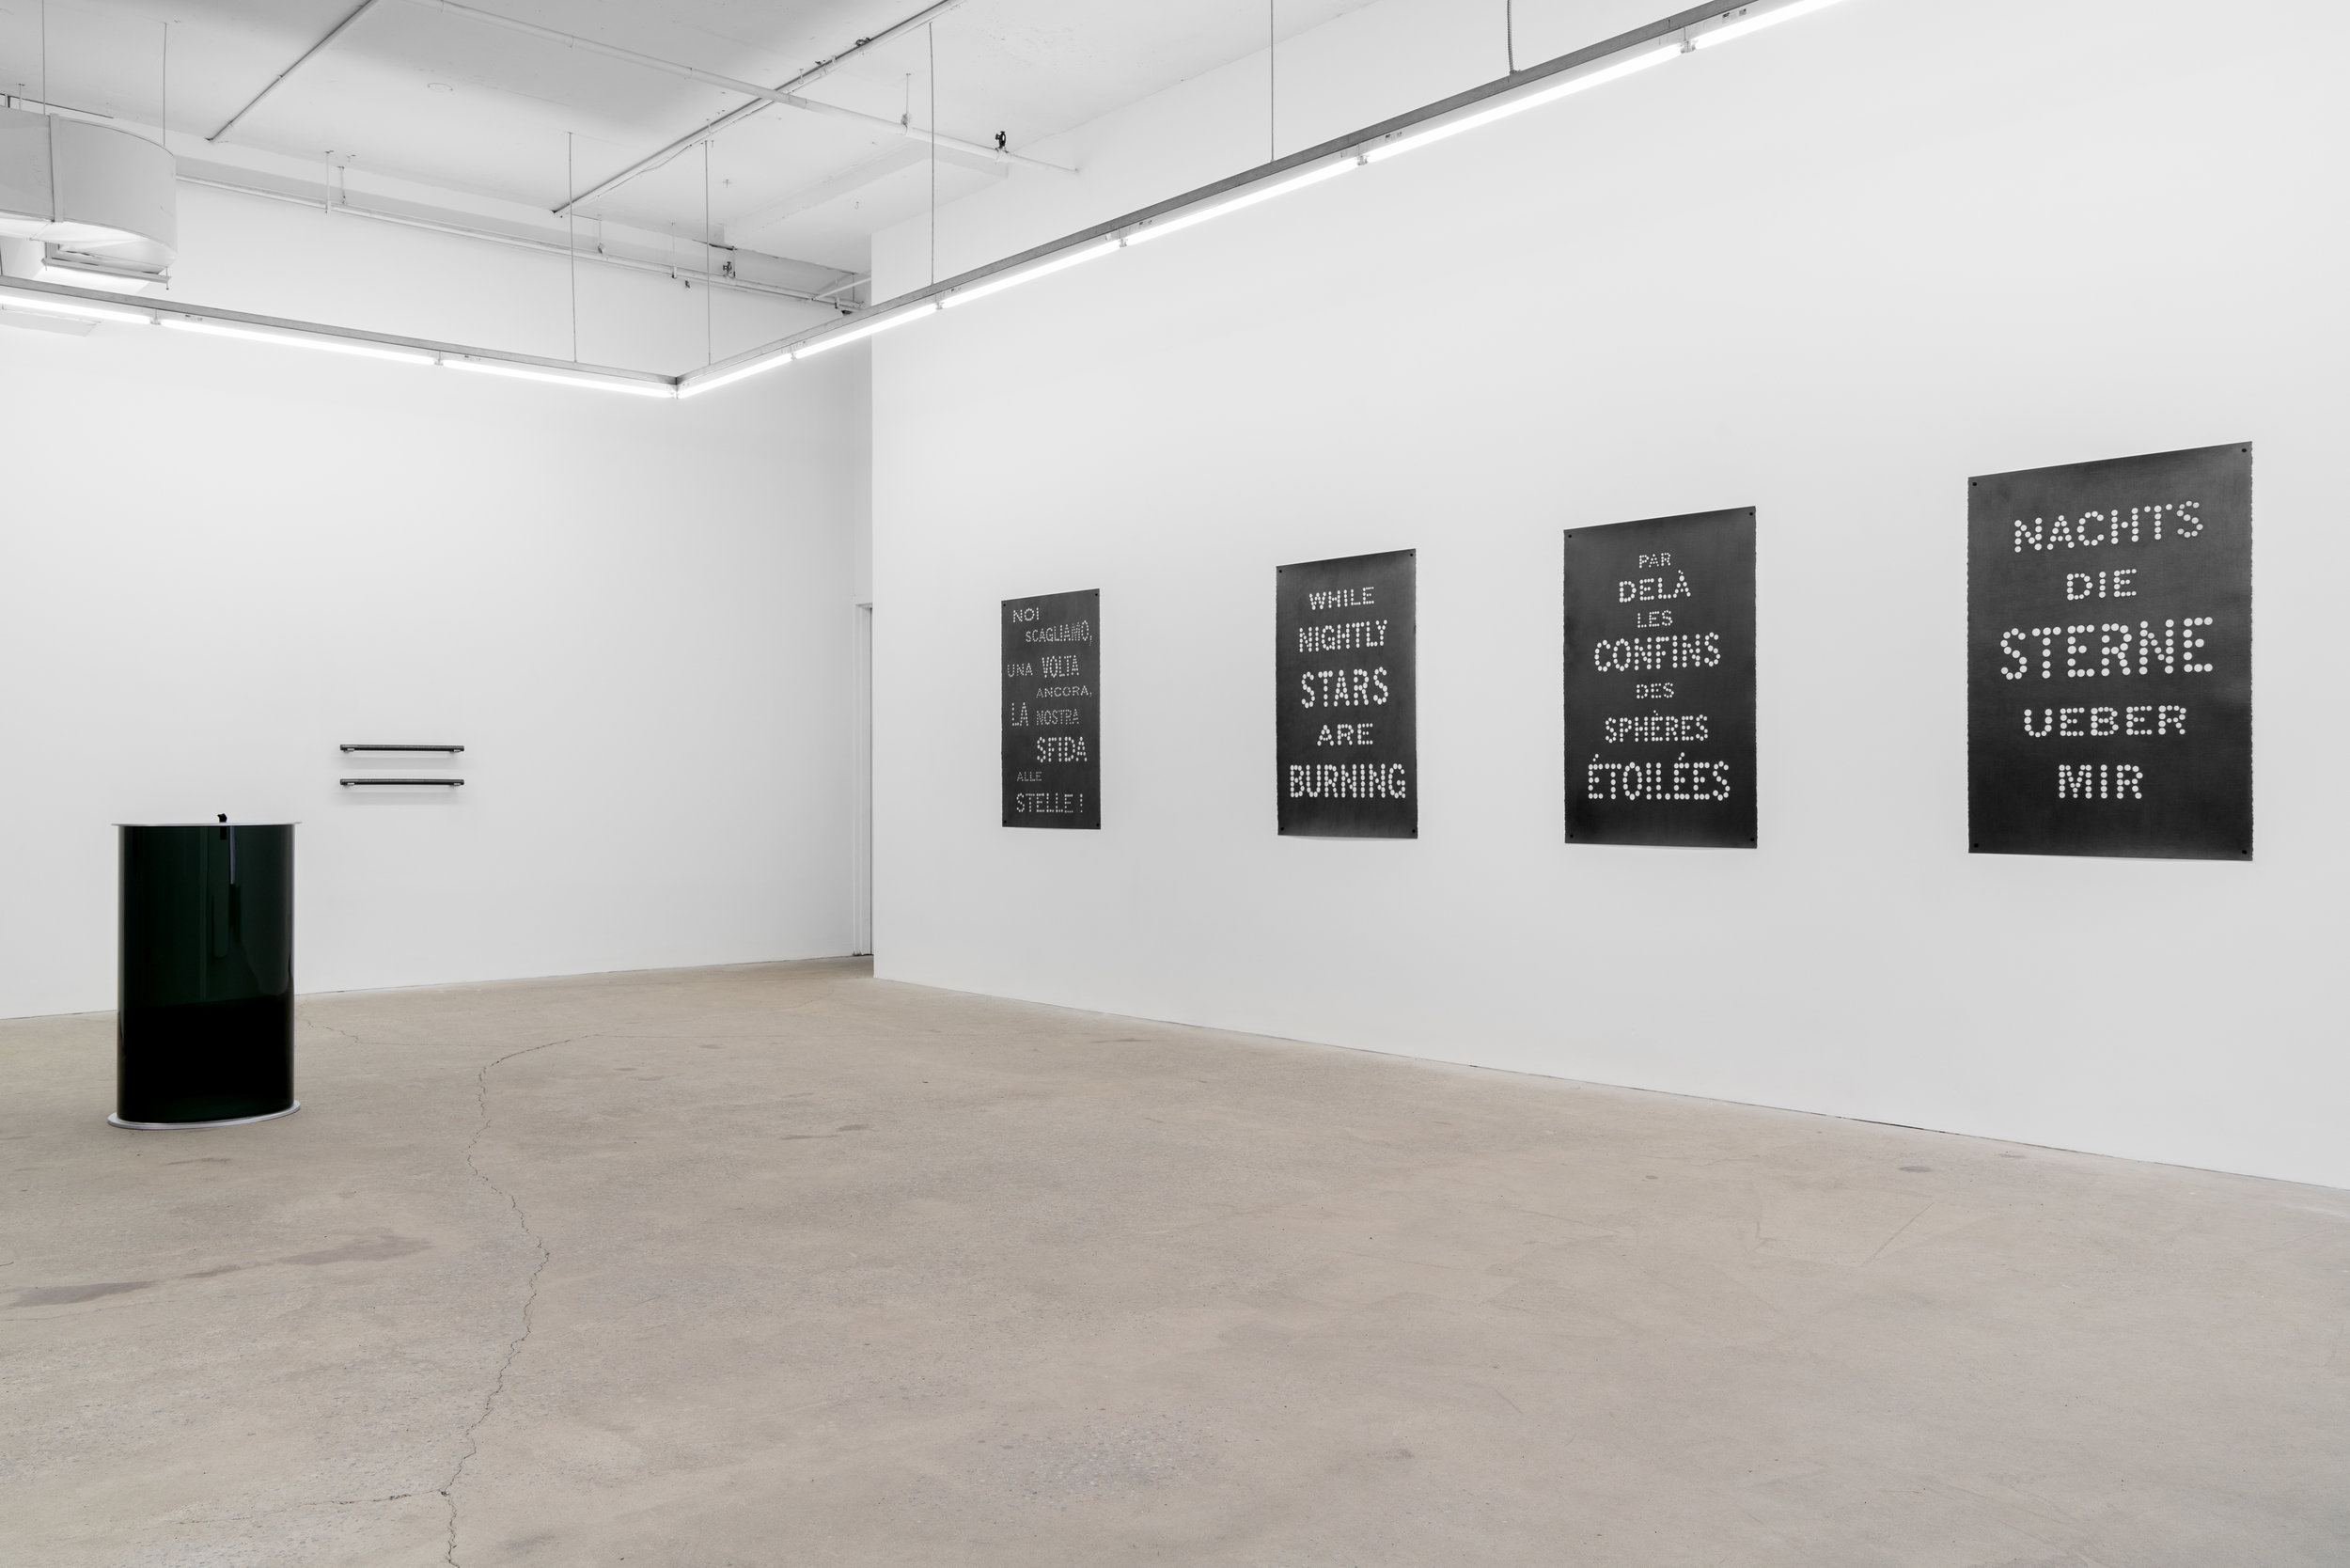 Das Gleitende - 2 , 2018, vue d'exposition, Galerie Nicolas Robert, photo : Jean-Michael Seminaro